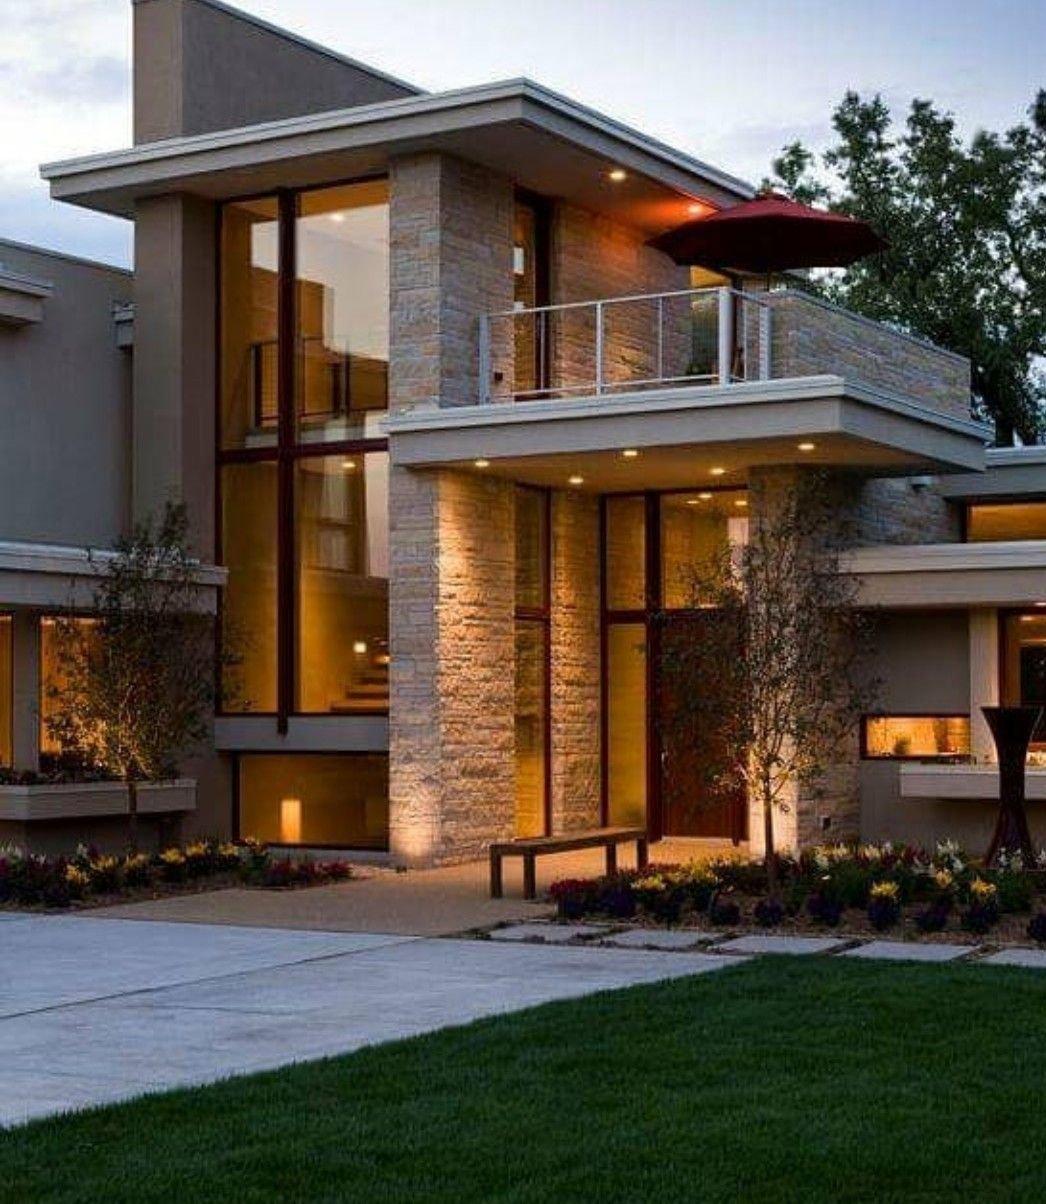 modern town house concept house designs exterior on most popular modern dream house exterior design ideas the best destination id=85893